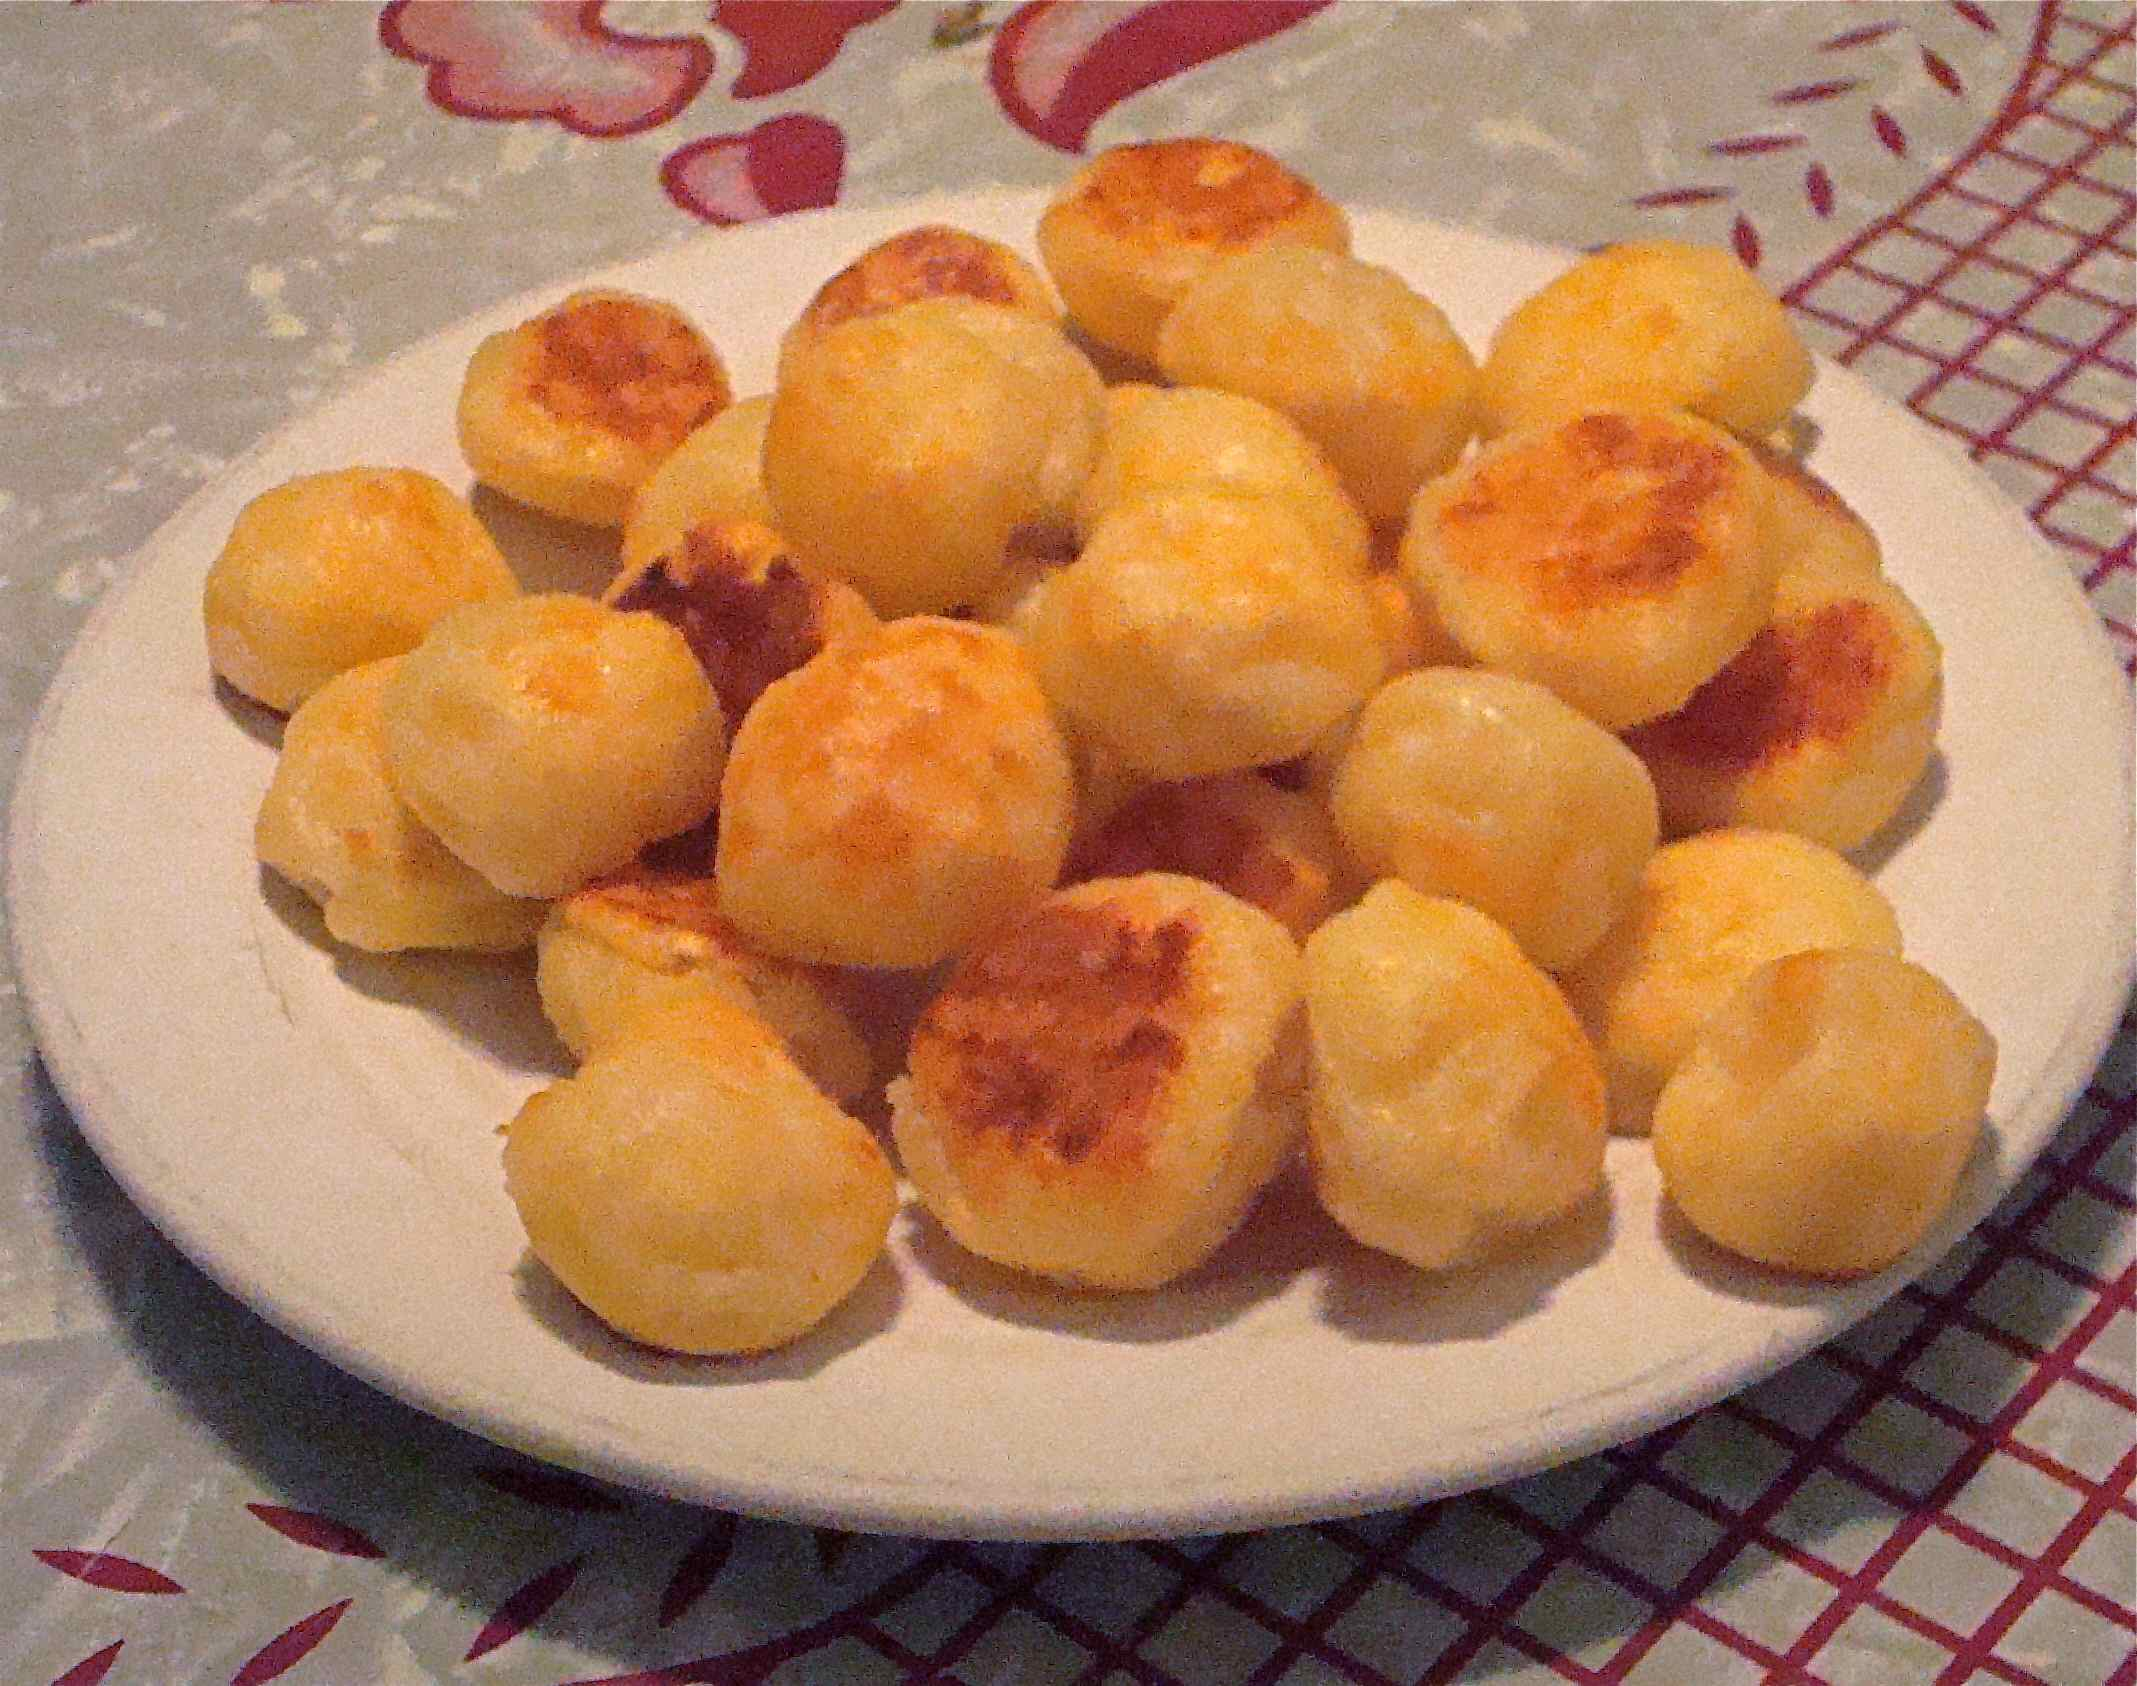 Little Cheesy Breads